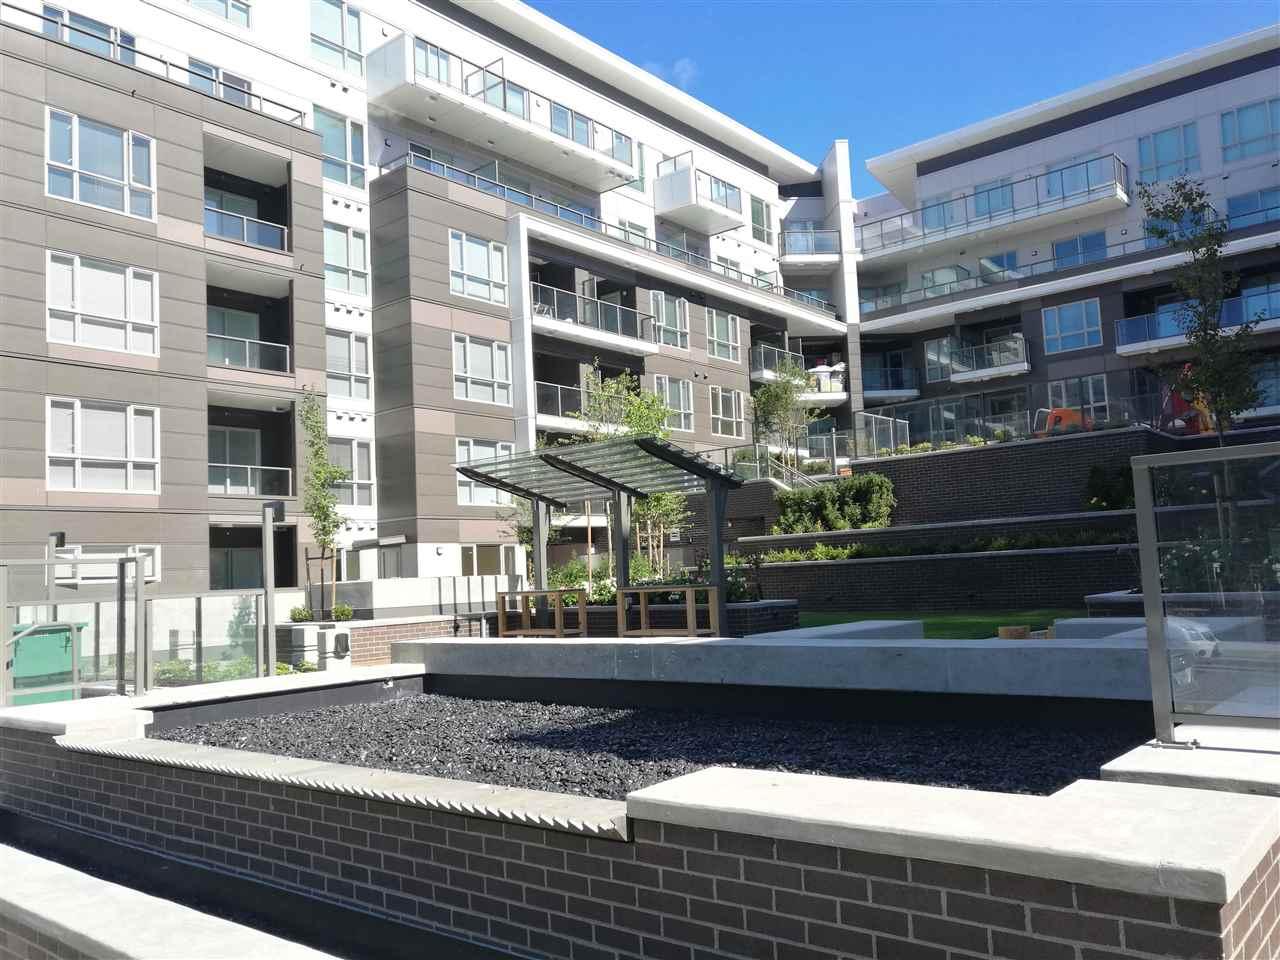 Condo Apartment at 330 7008 RIVER PARKWAY, Unit 330, Richmond, British Columbia. Image 1